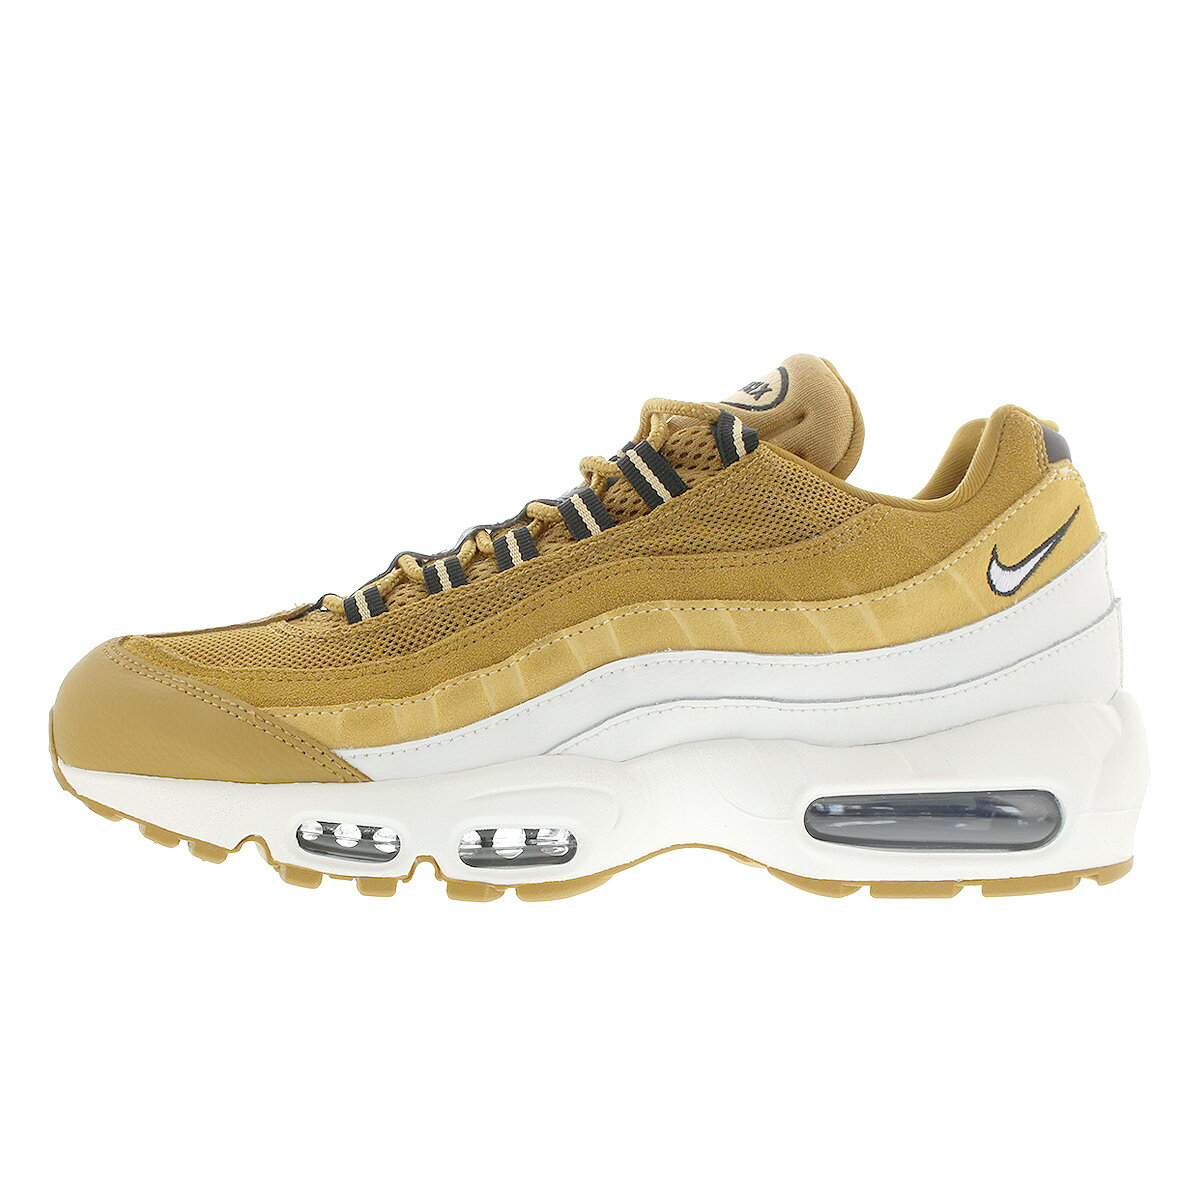 Nike Air Max 95 Wheat Gold AT9865 700 Store List